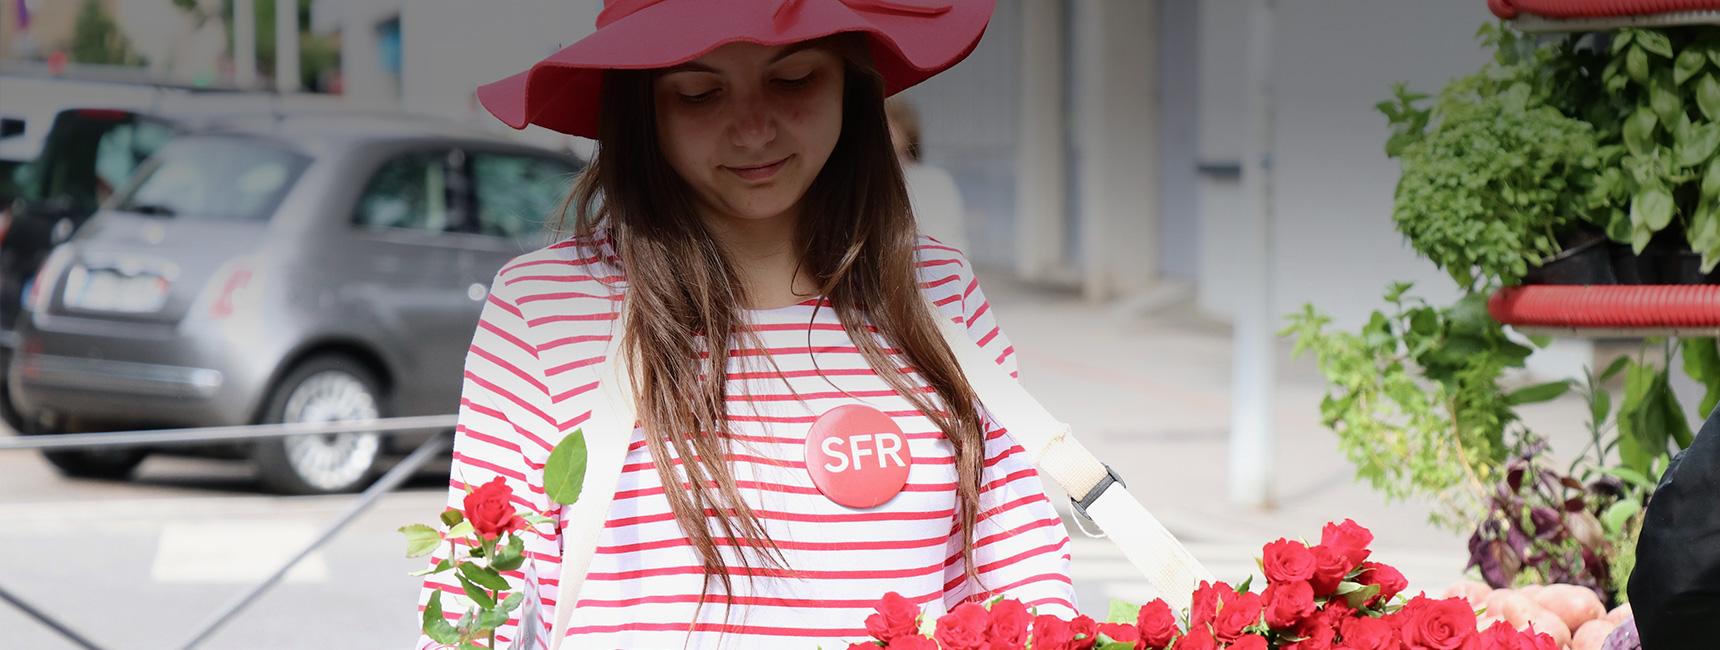 SFR street marketing Keemia Lyon Agence marketing local en région Rhônes Alpes